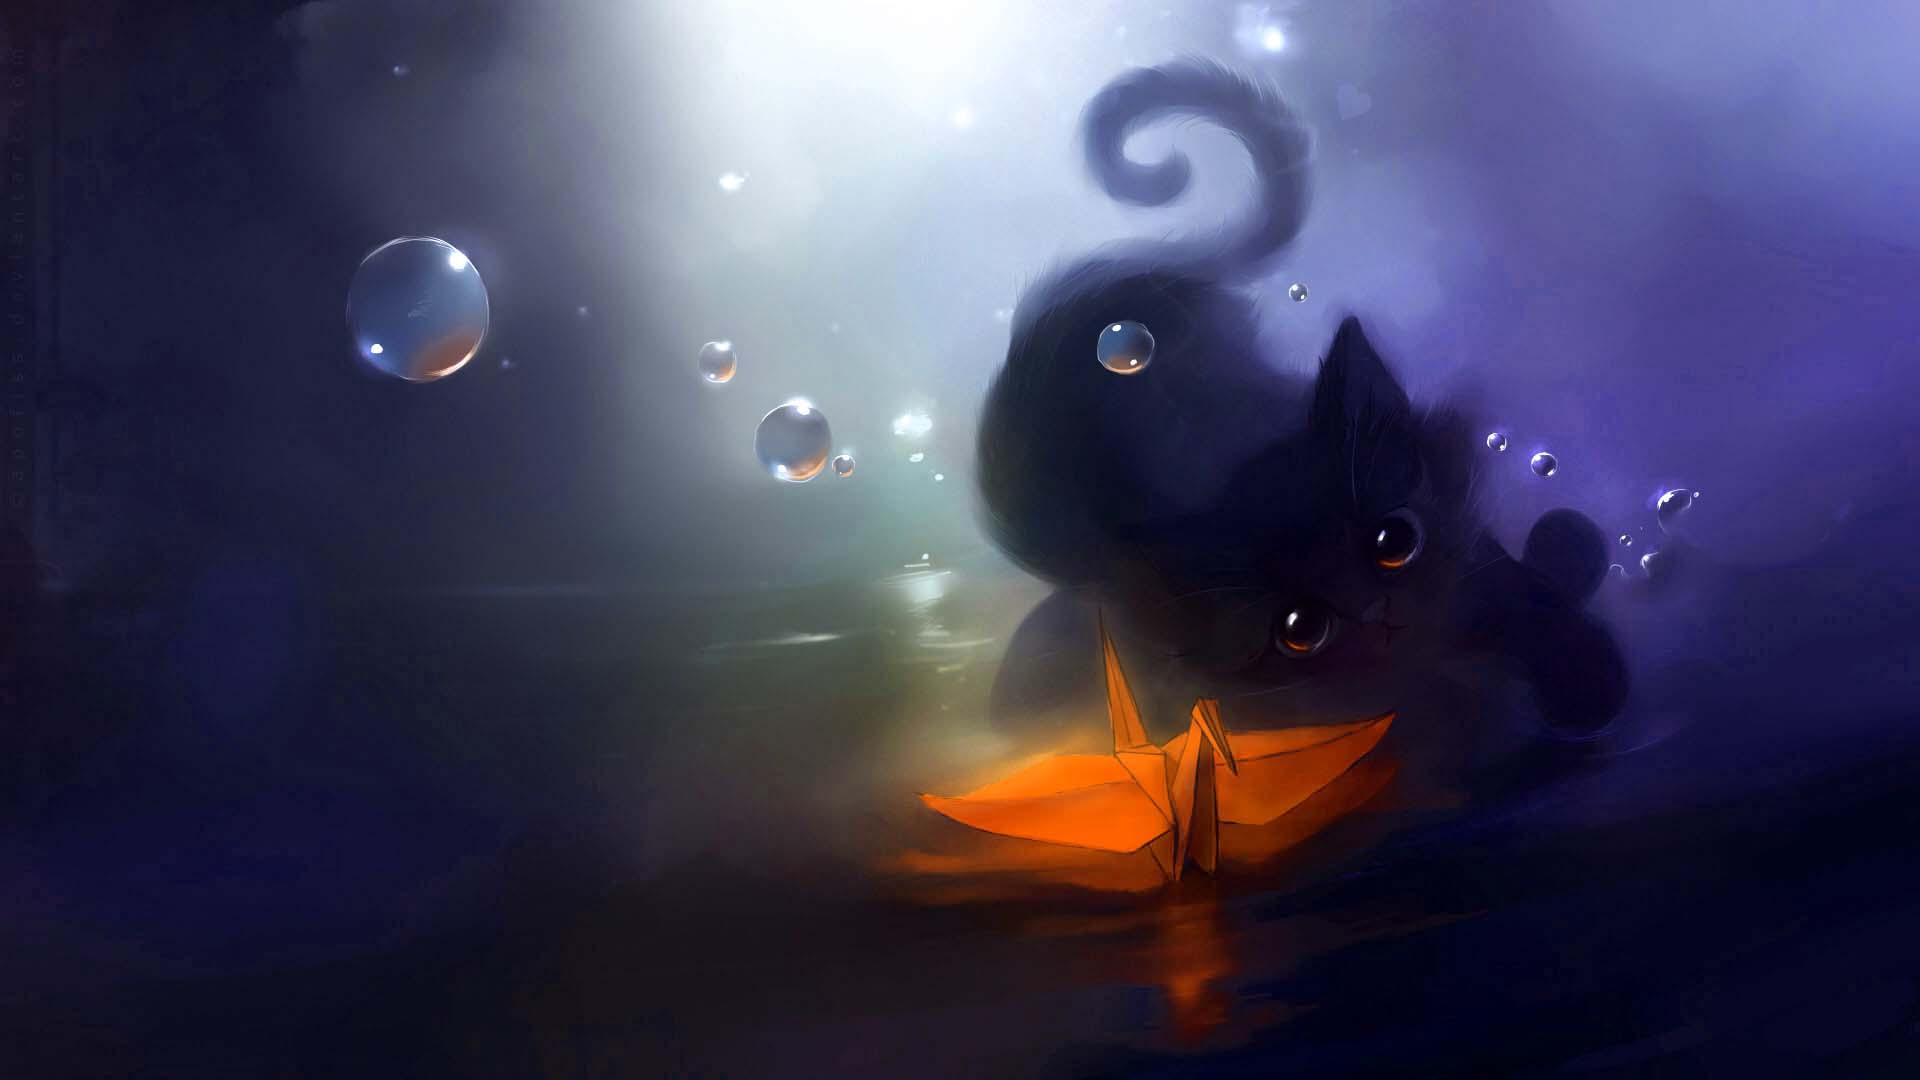 Drawn wallpaper cute anime cat Px Free Animal Black 1920x1080